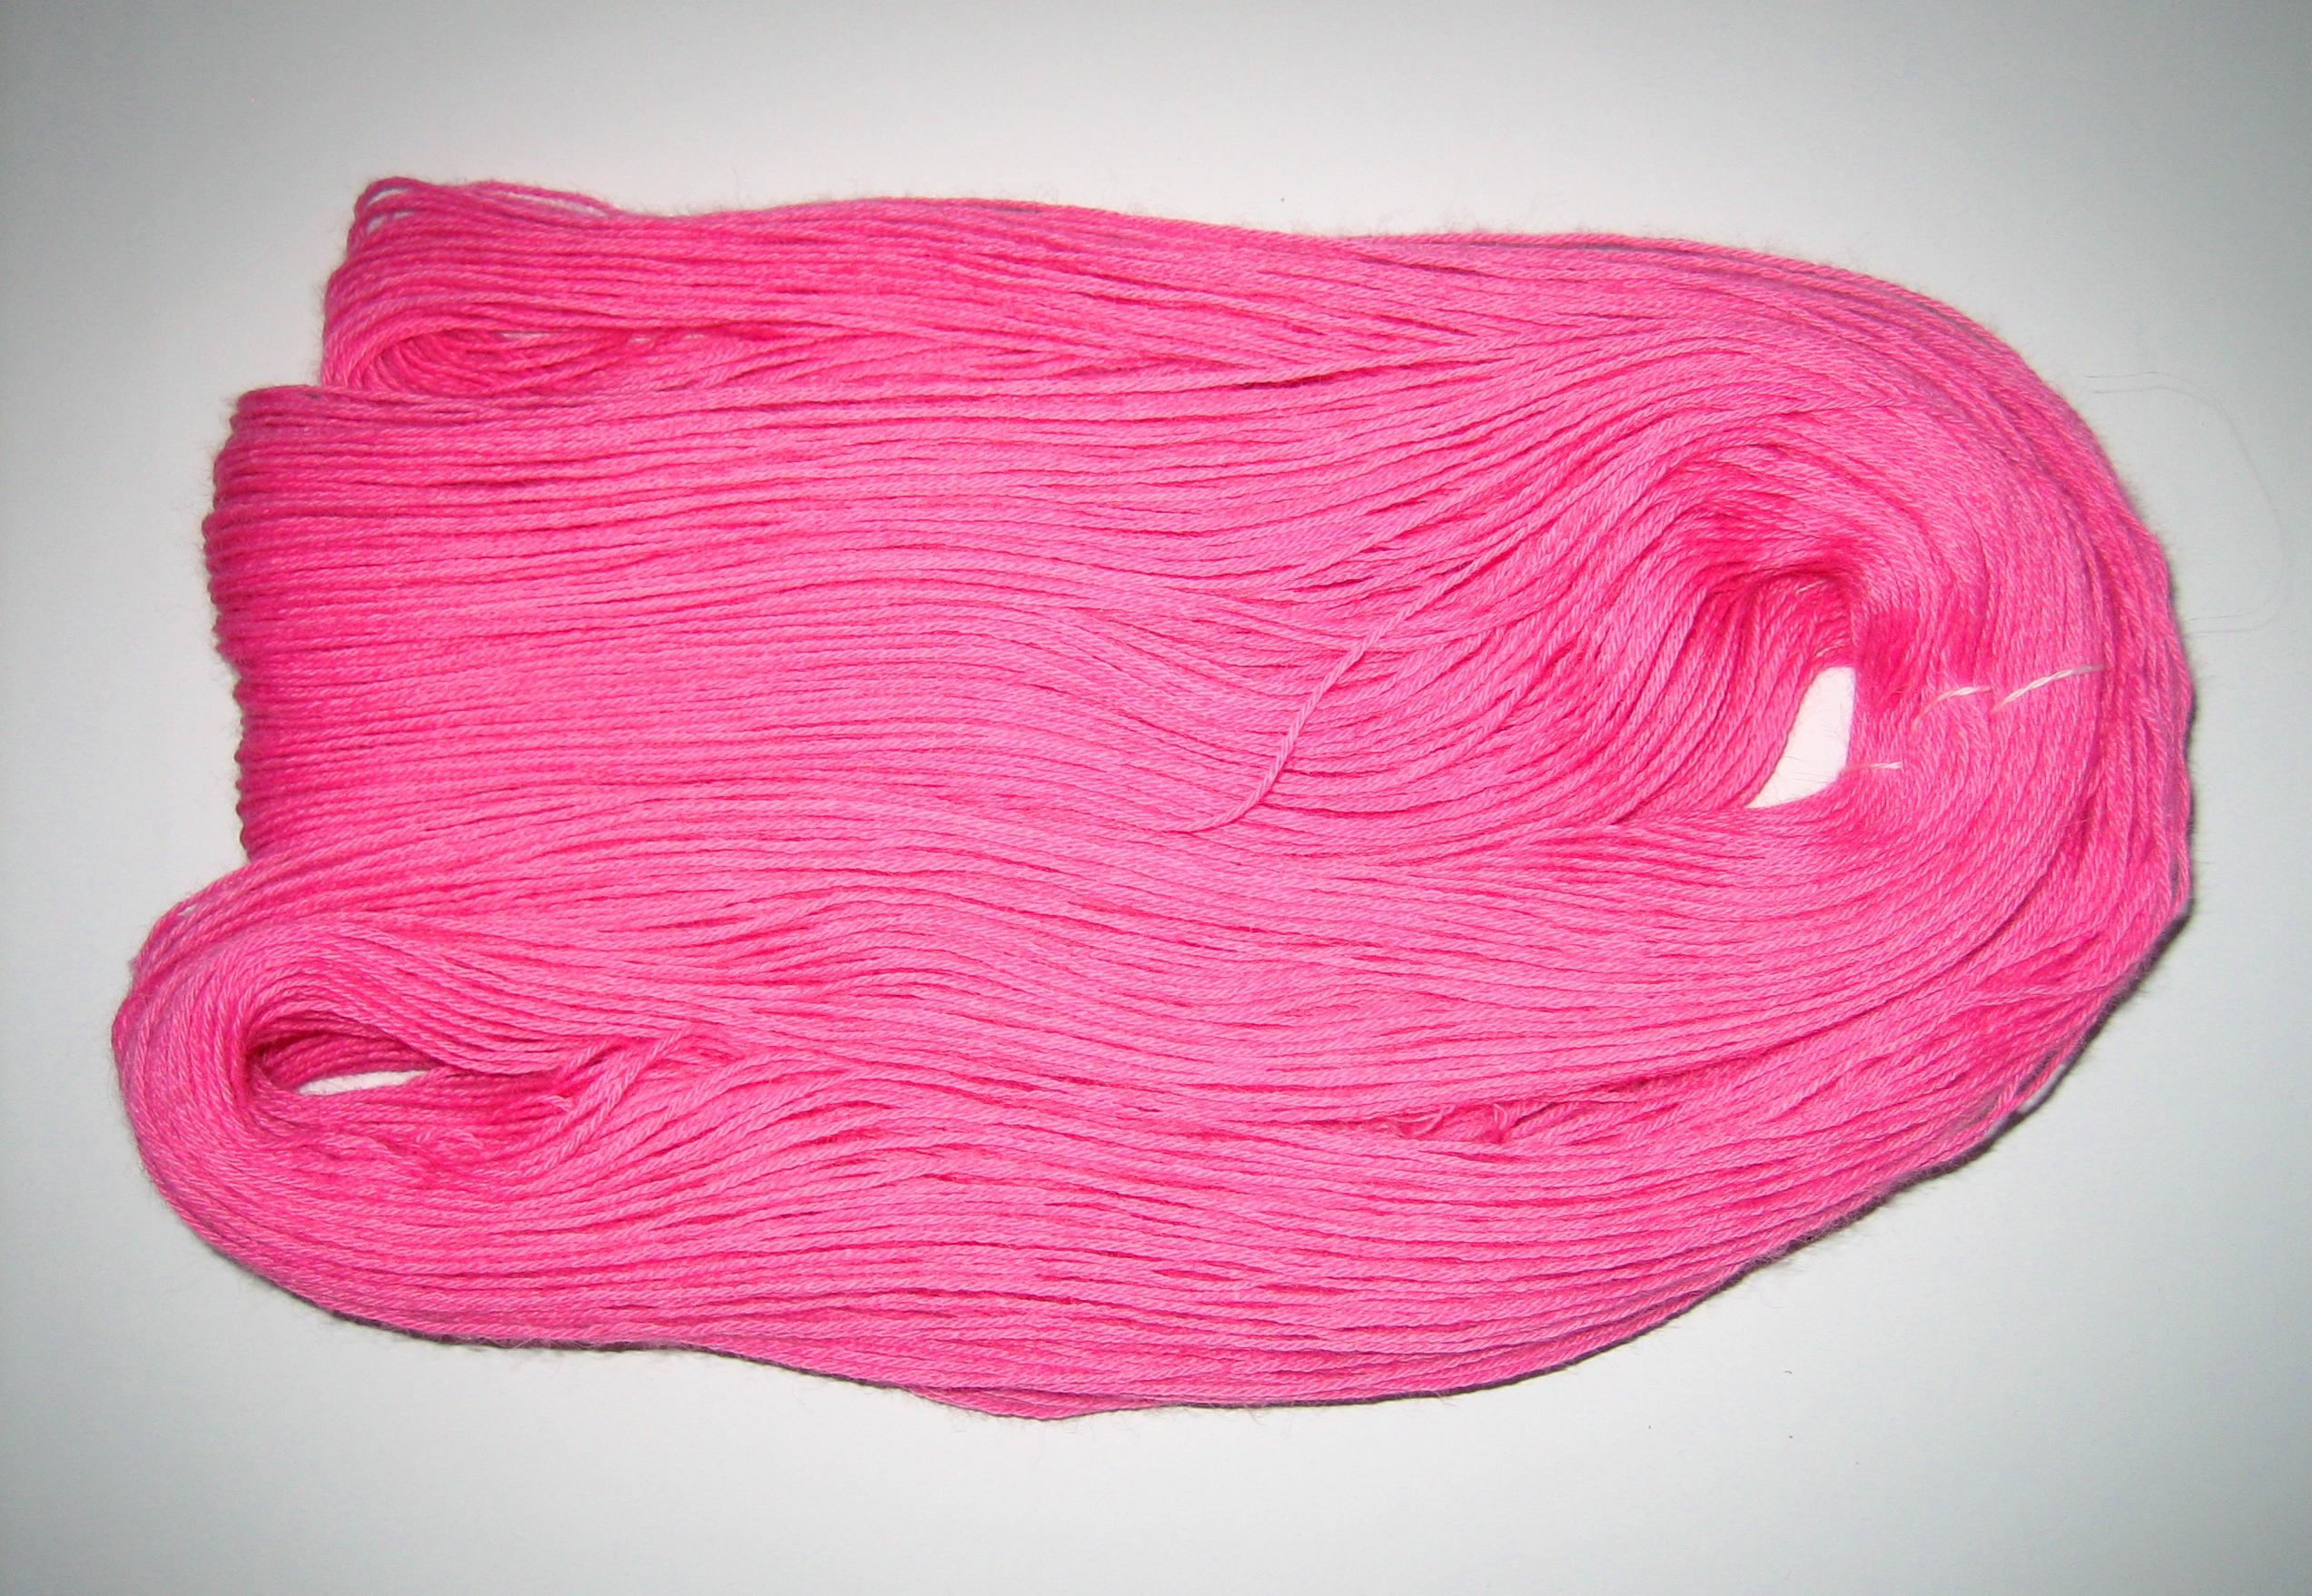 garnyarn-håndfarvet-garn-tynd-babyalpaka-lyseroed